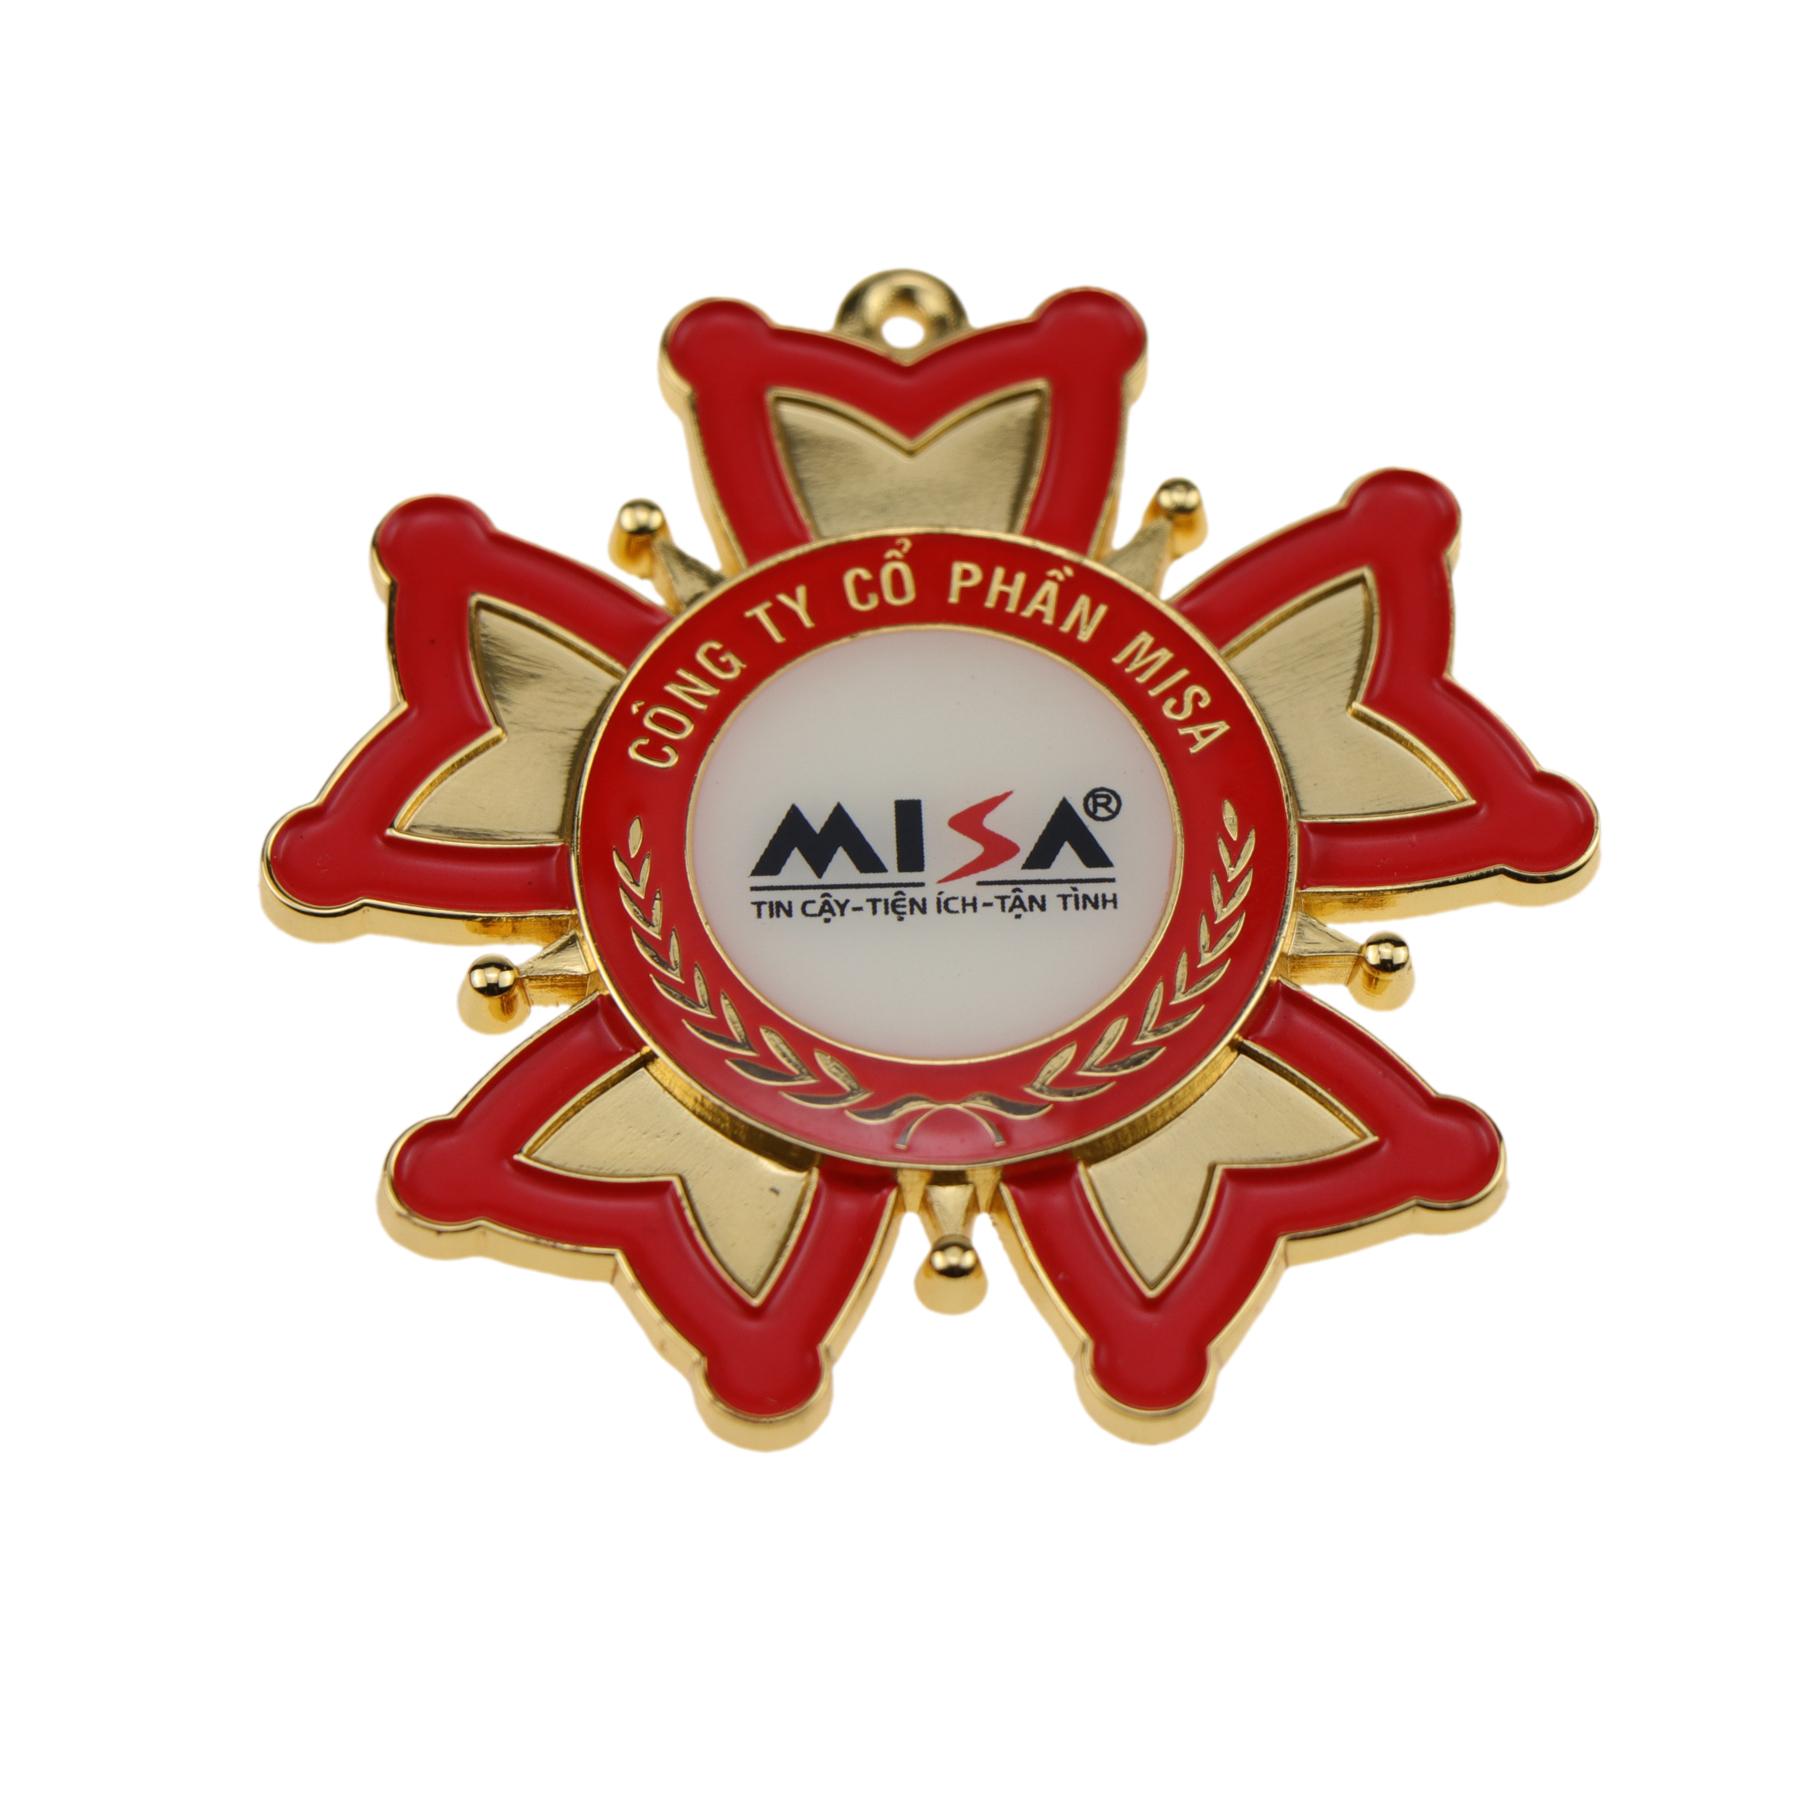 Custom 3D โลหะ badge of honor สำหรับของที่ระลึก